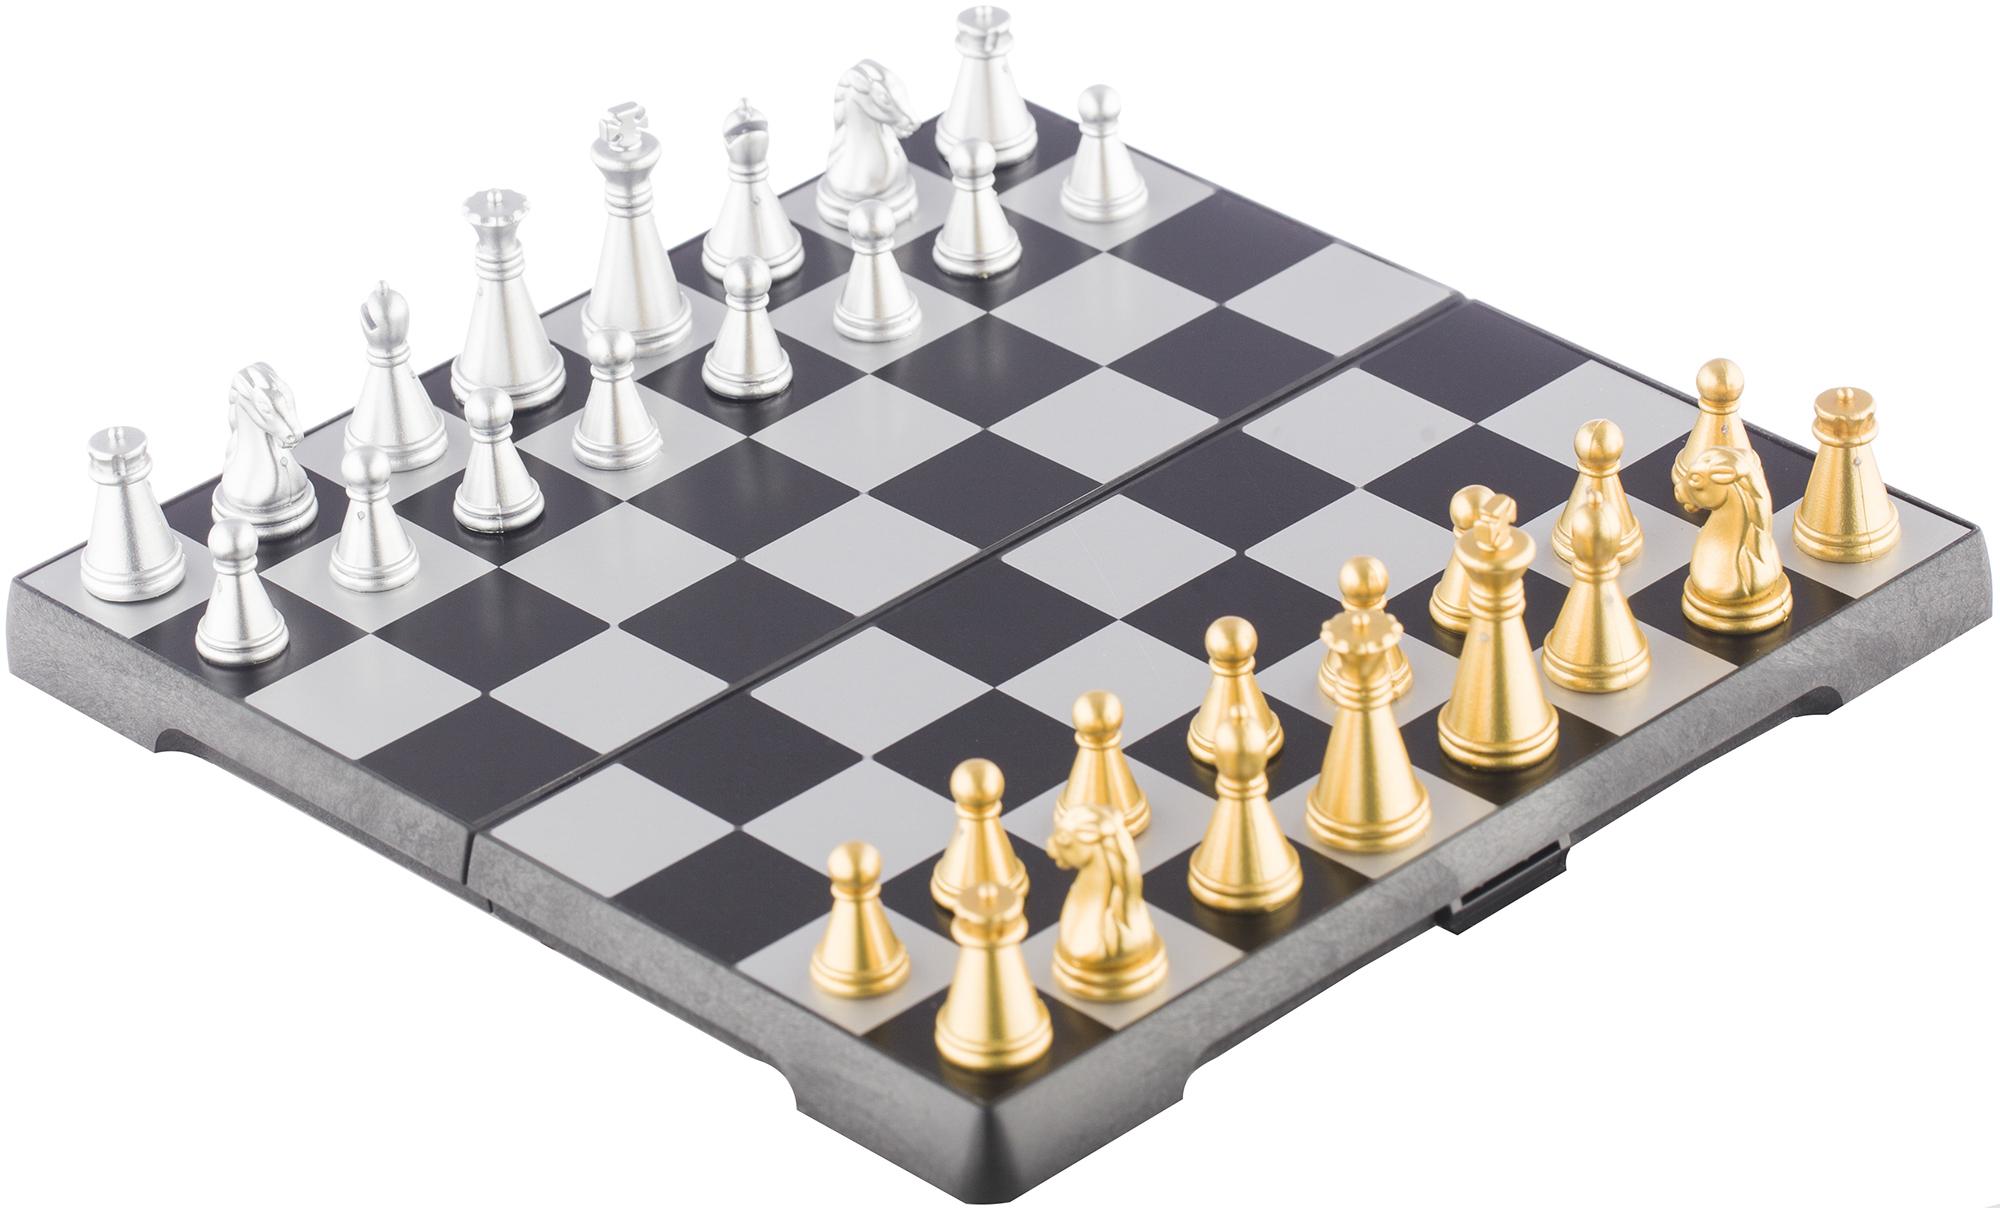 Torneo Игра Шахматы Torneo